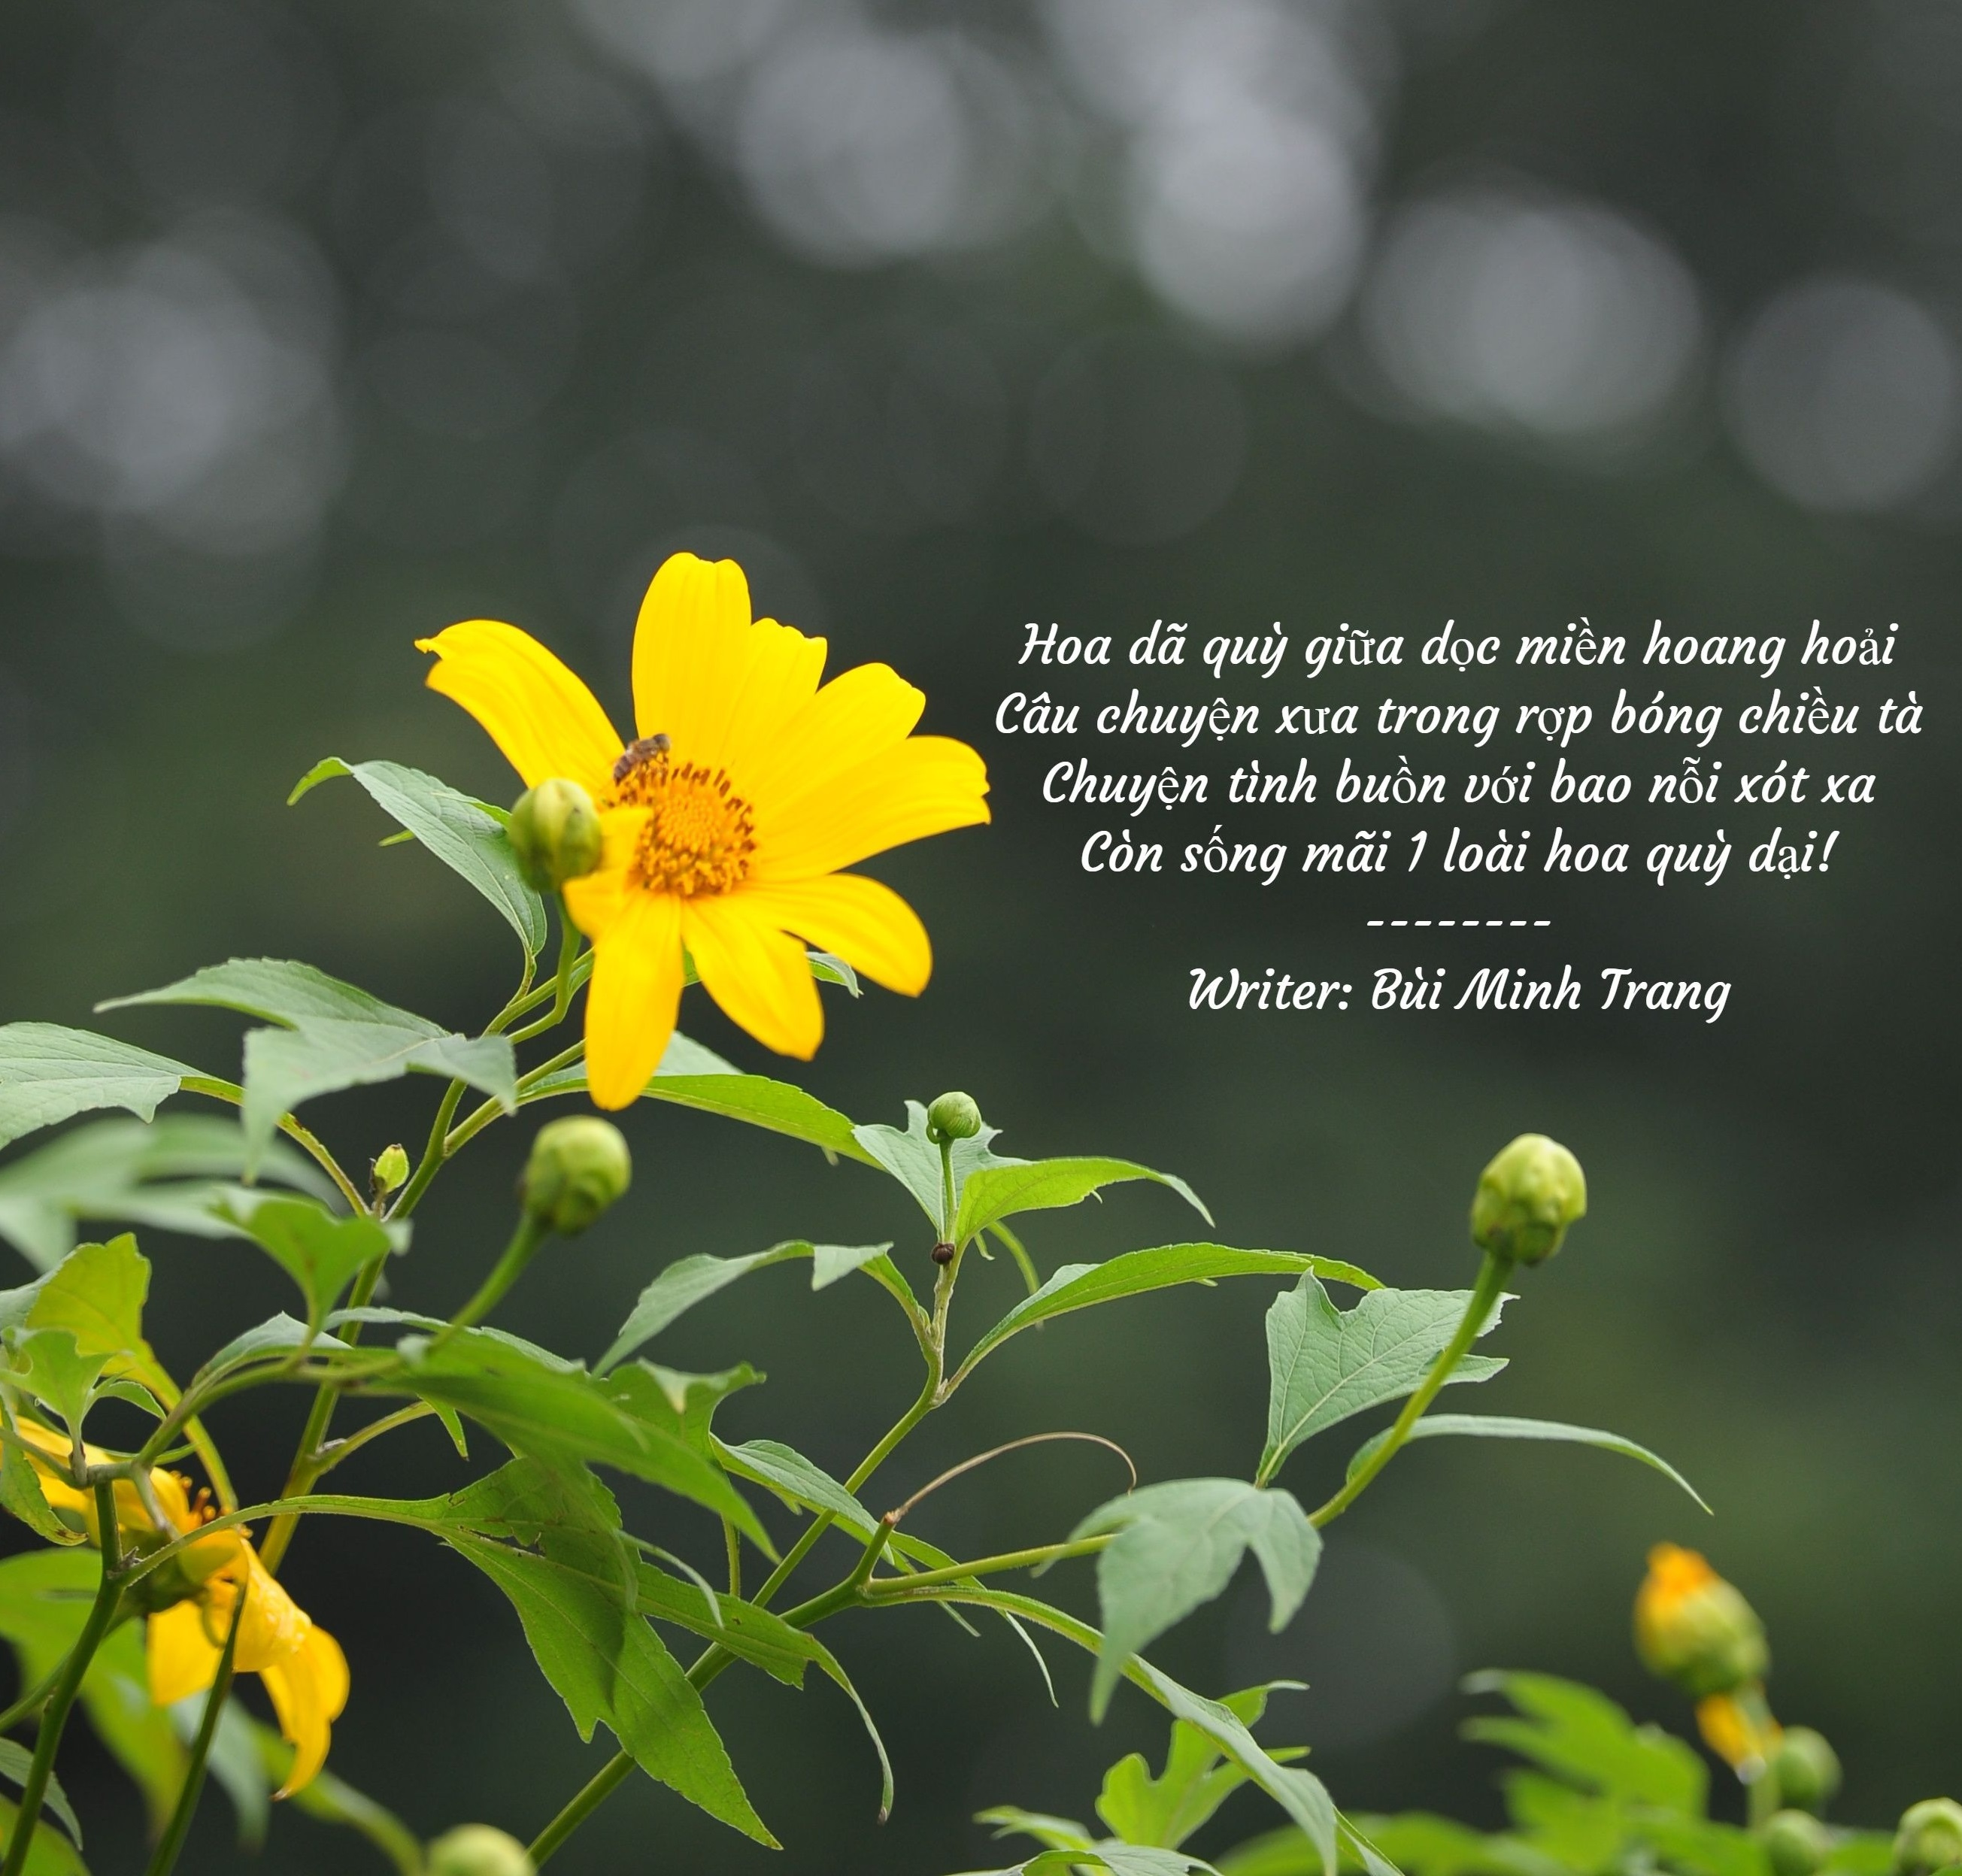 Hoa dã quỳ giữa dọc miền hoang hoải